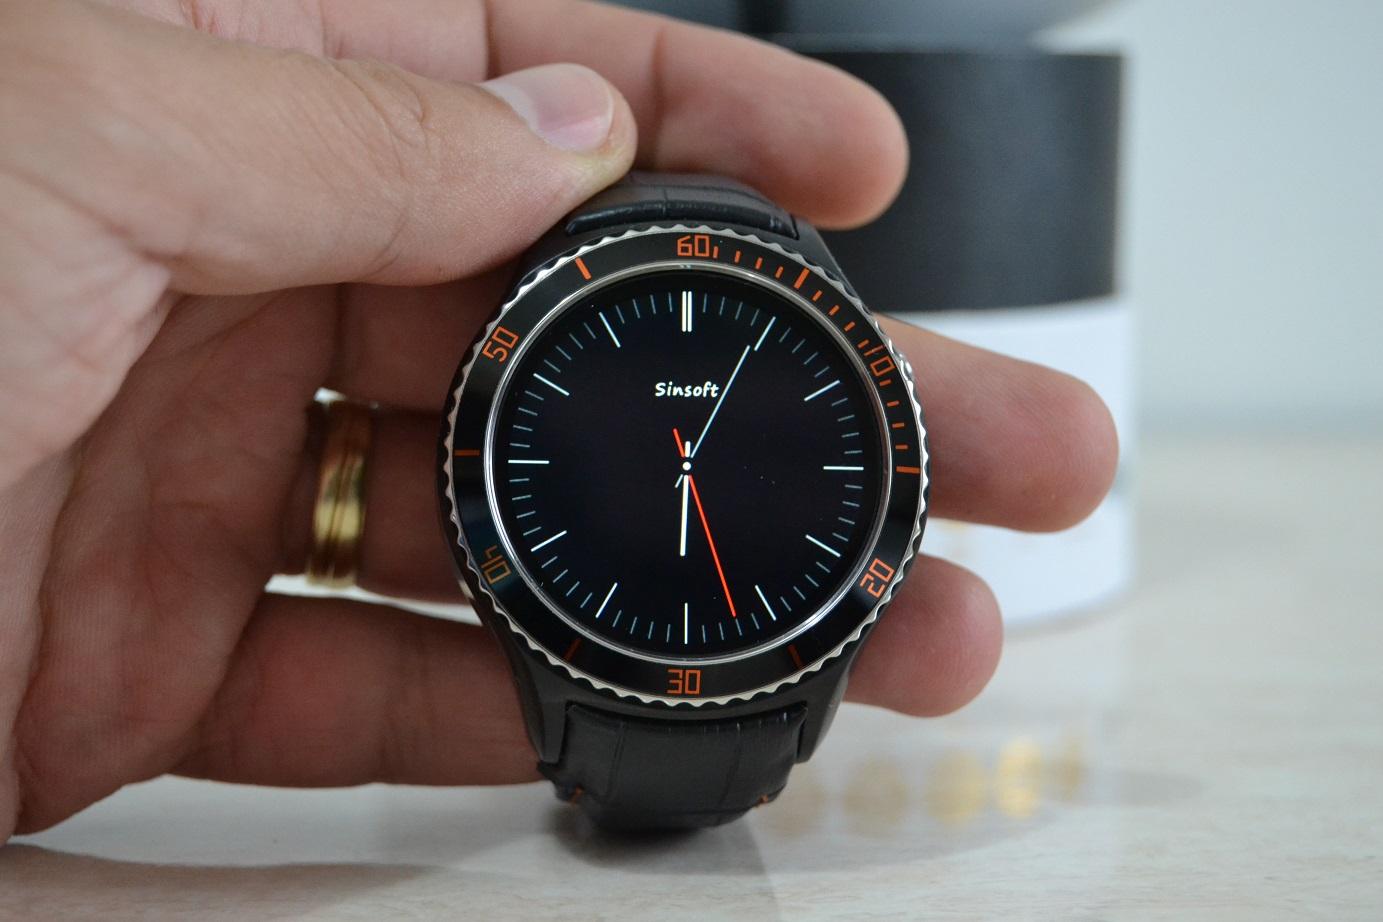 Unboxing si primele pareri, IQI I2 smartwatch cu Android, 3G si WiFi